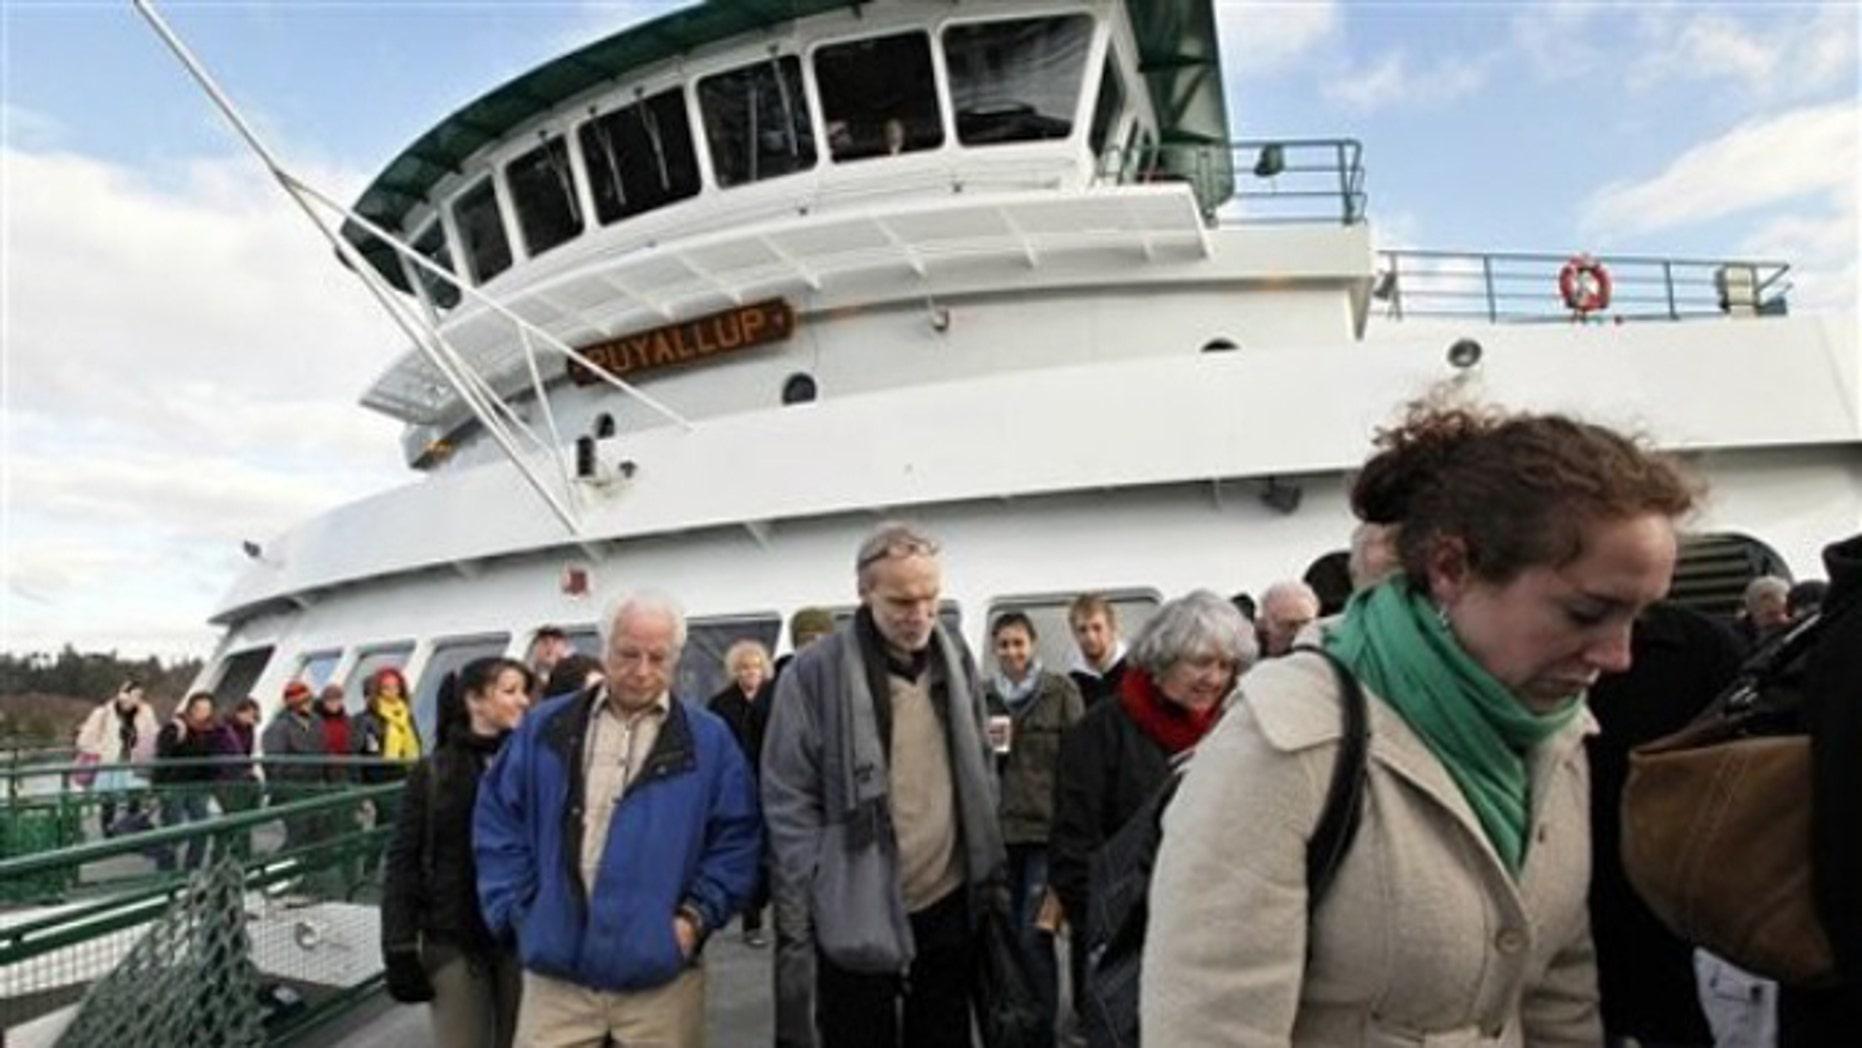 Dec. 21, 2011: Passengers disembark from the Washington state ferry Puyallup on its arrival on Bainbridge Island, Wash.